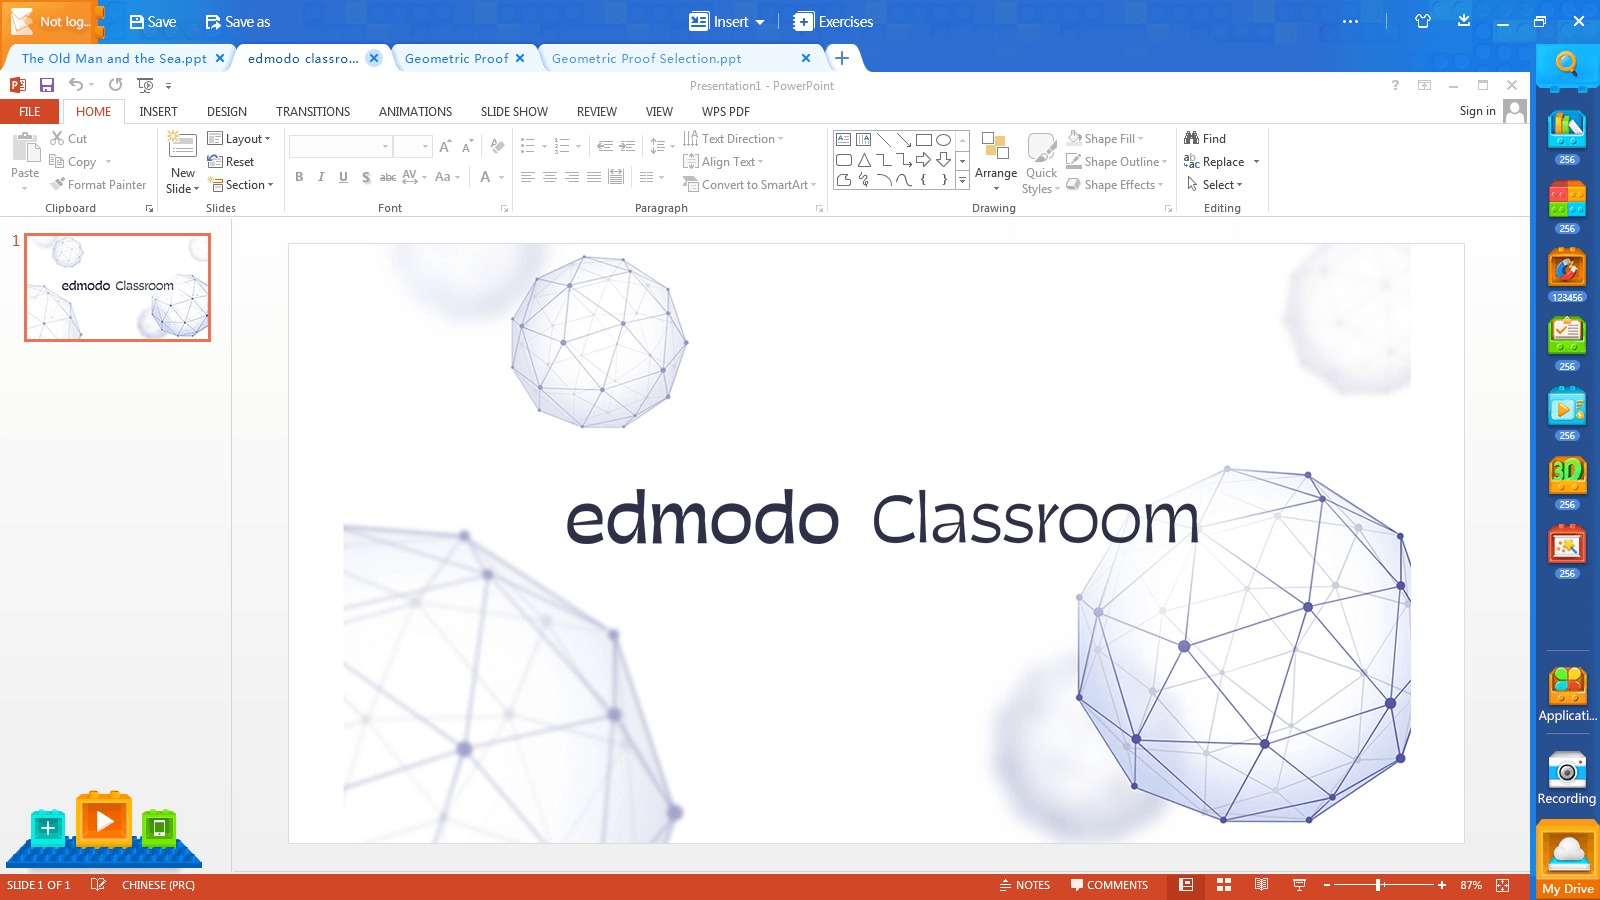 Edmodo Classroom